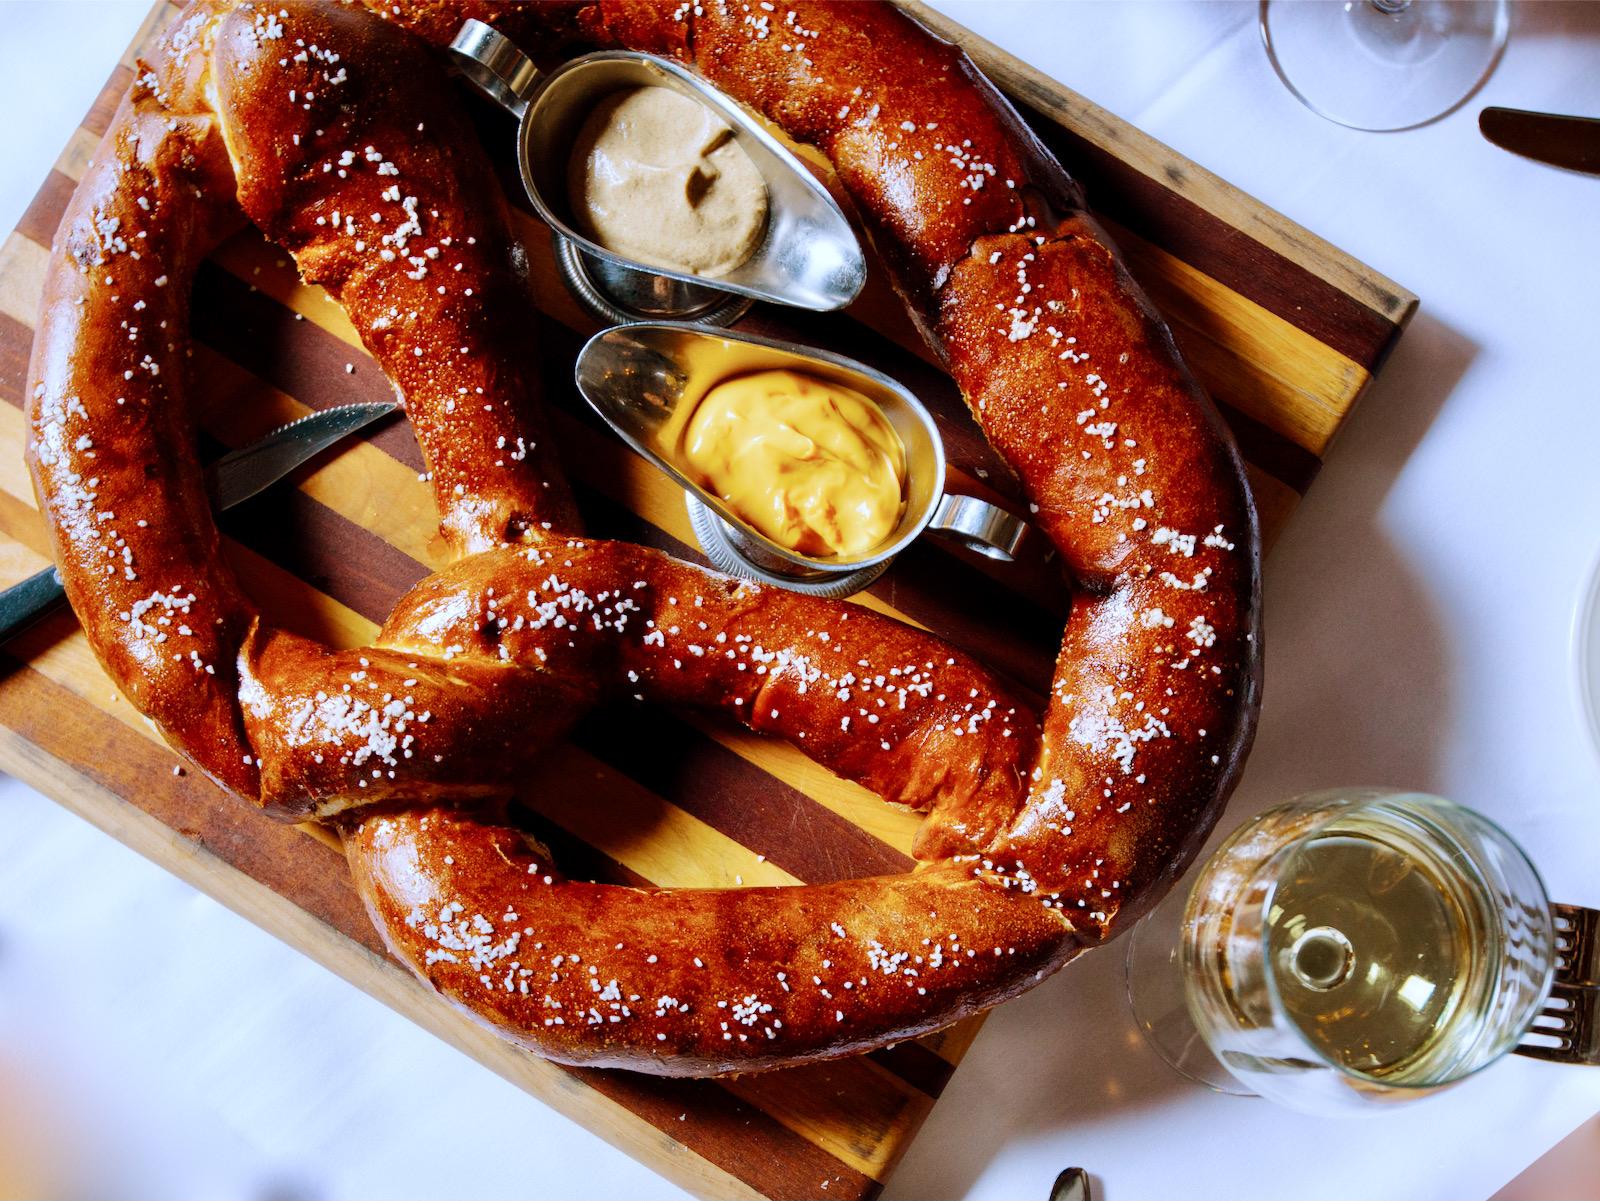 pretzel at Mader's